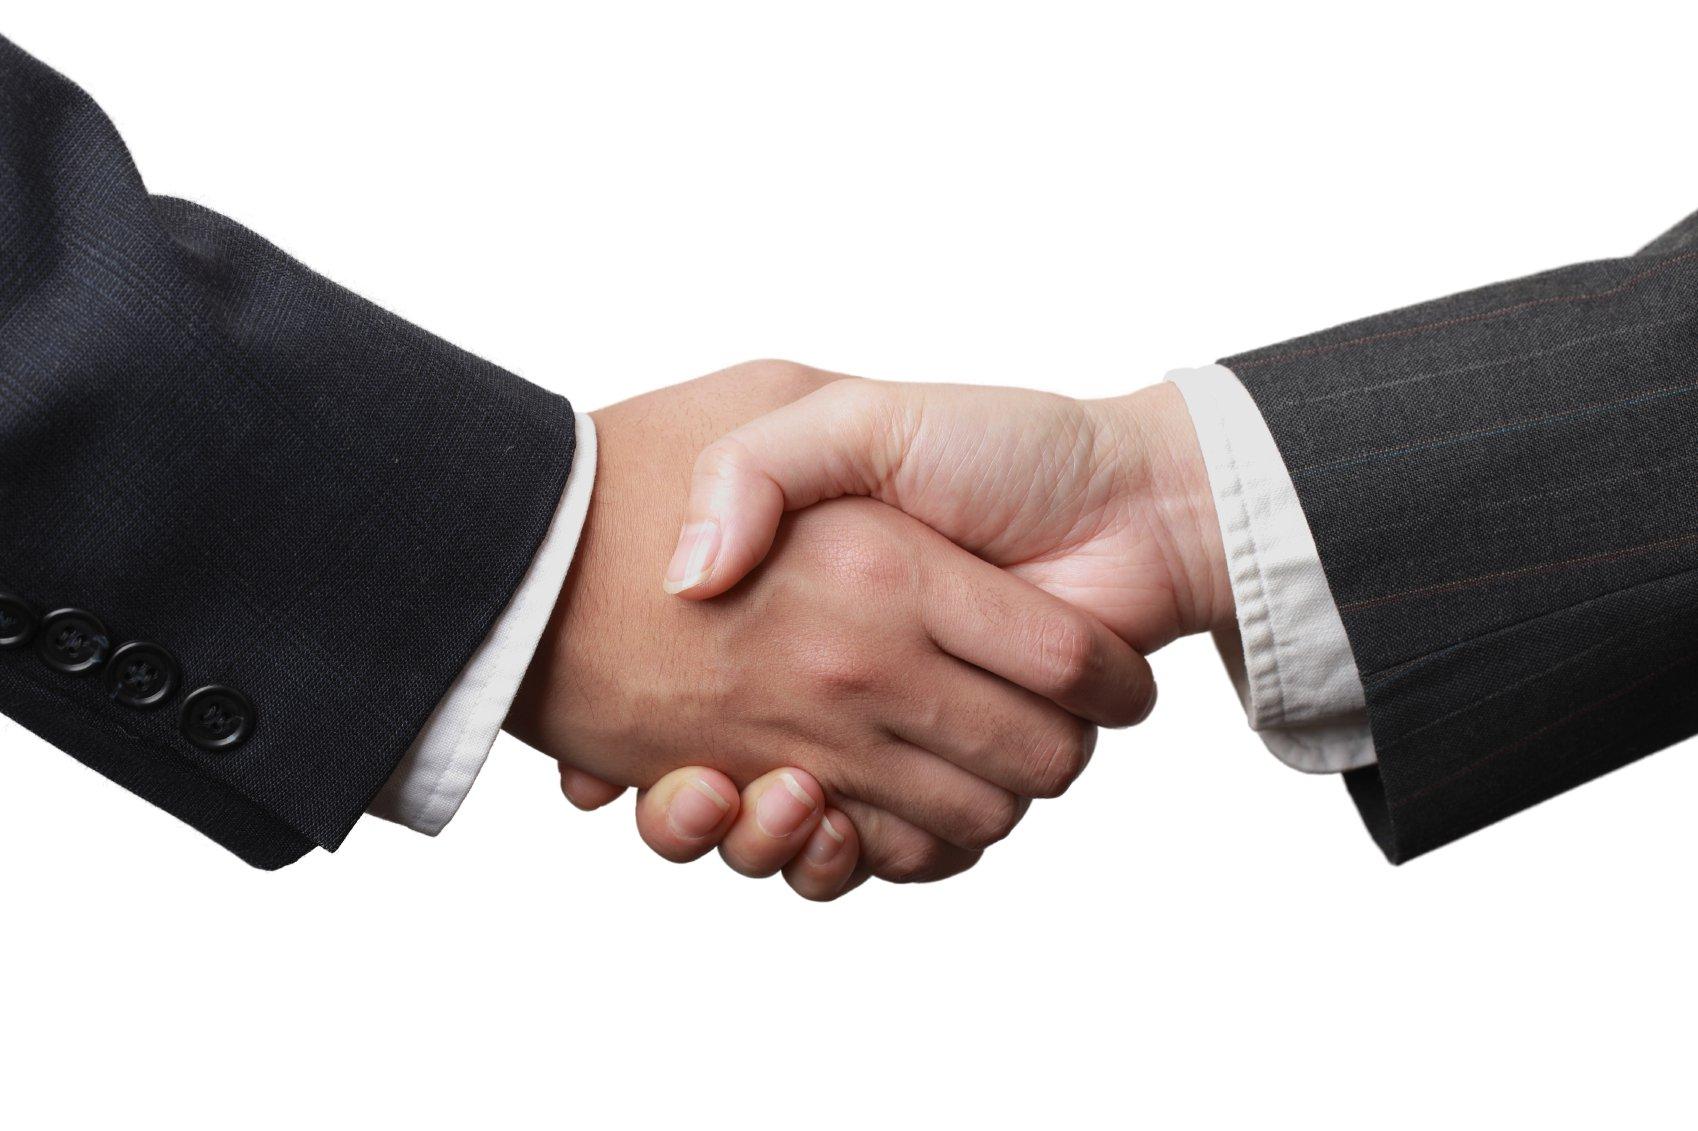 handskakning - signerat kontrakt Barnvakt Stockholm